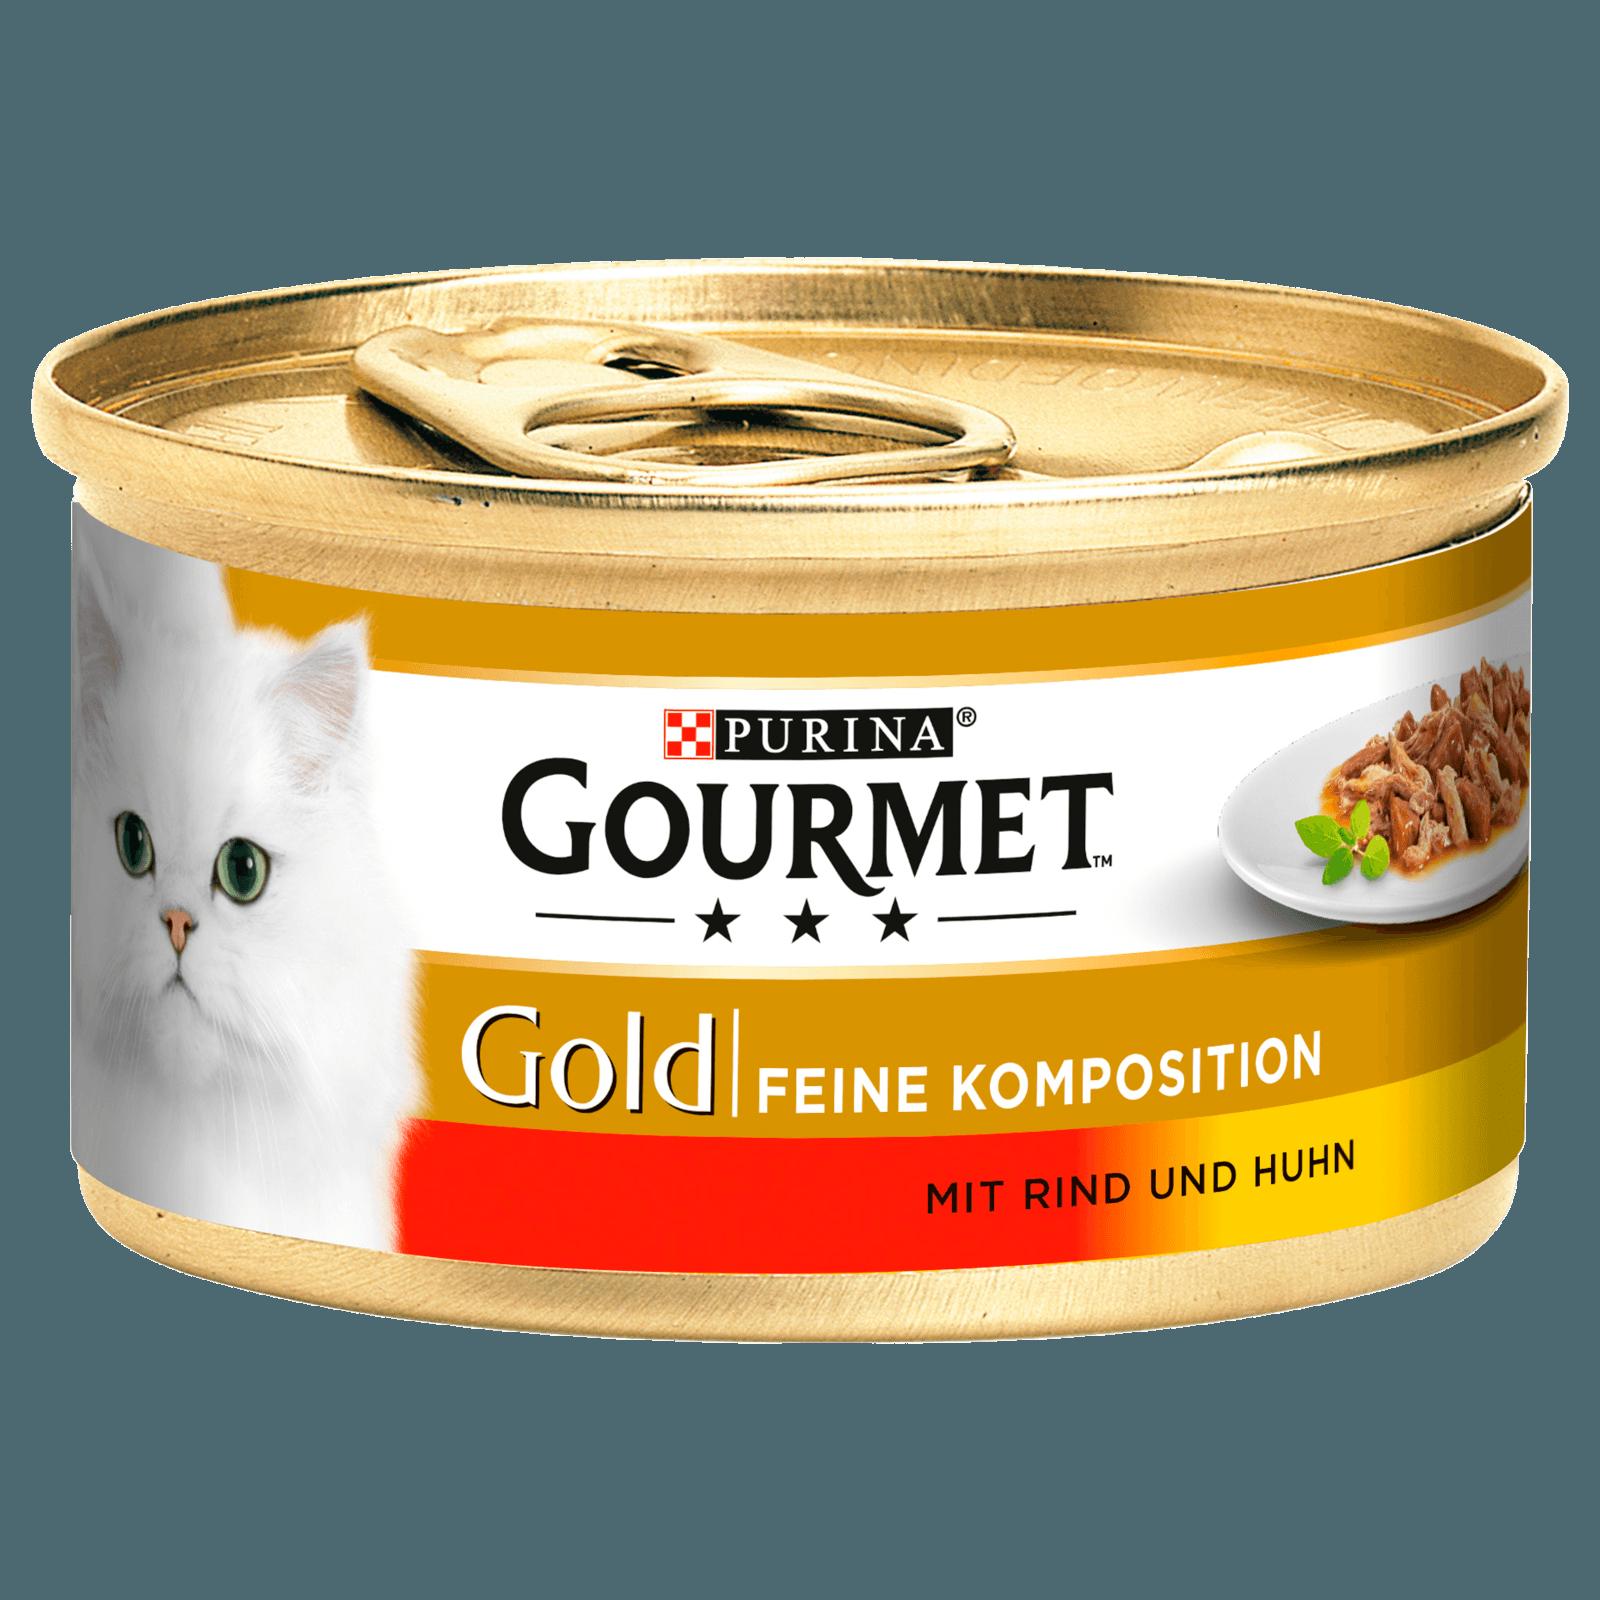 PURINA GOURMET GOLD Feine Komposition Rind&Huhn 85g